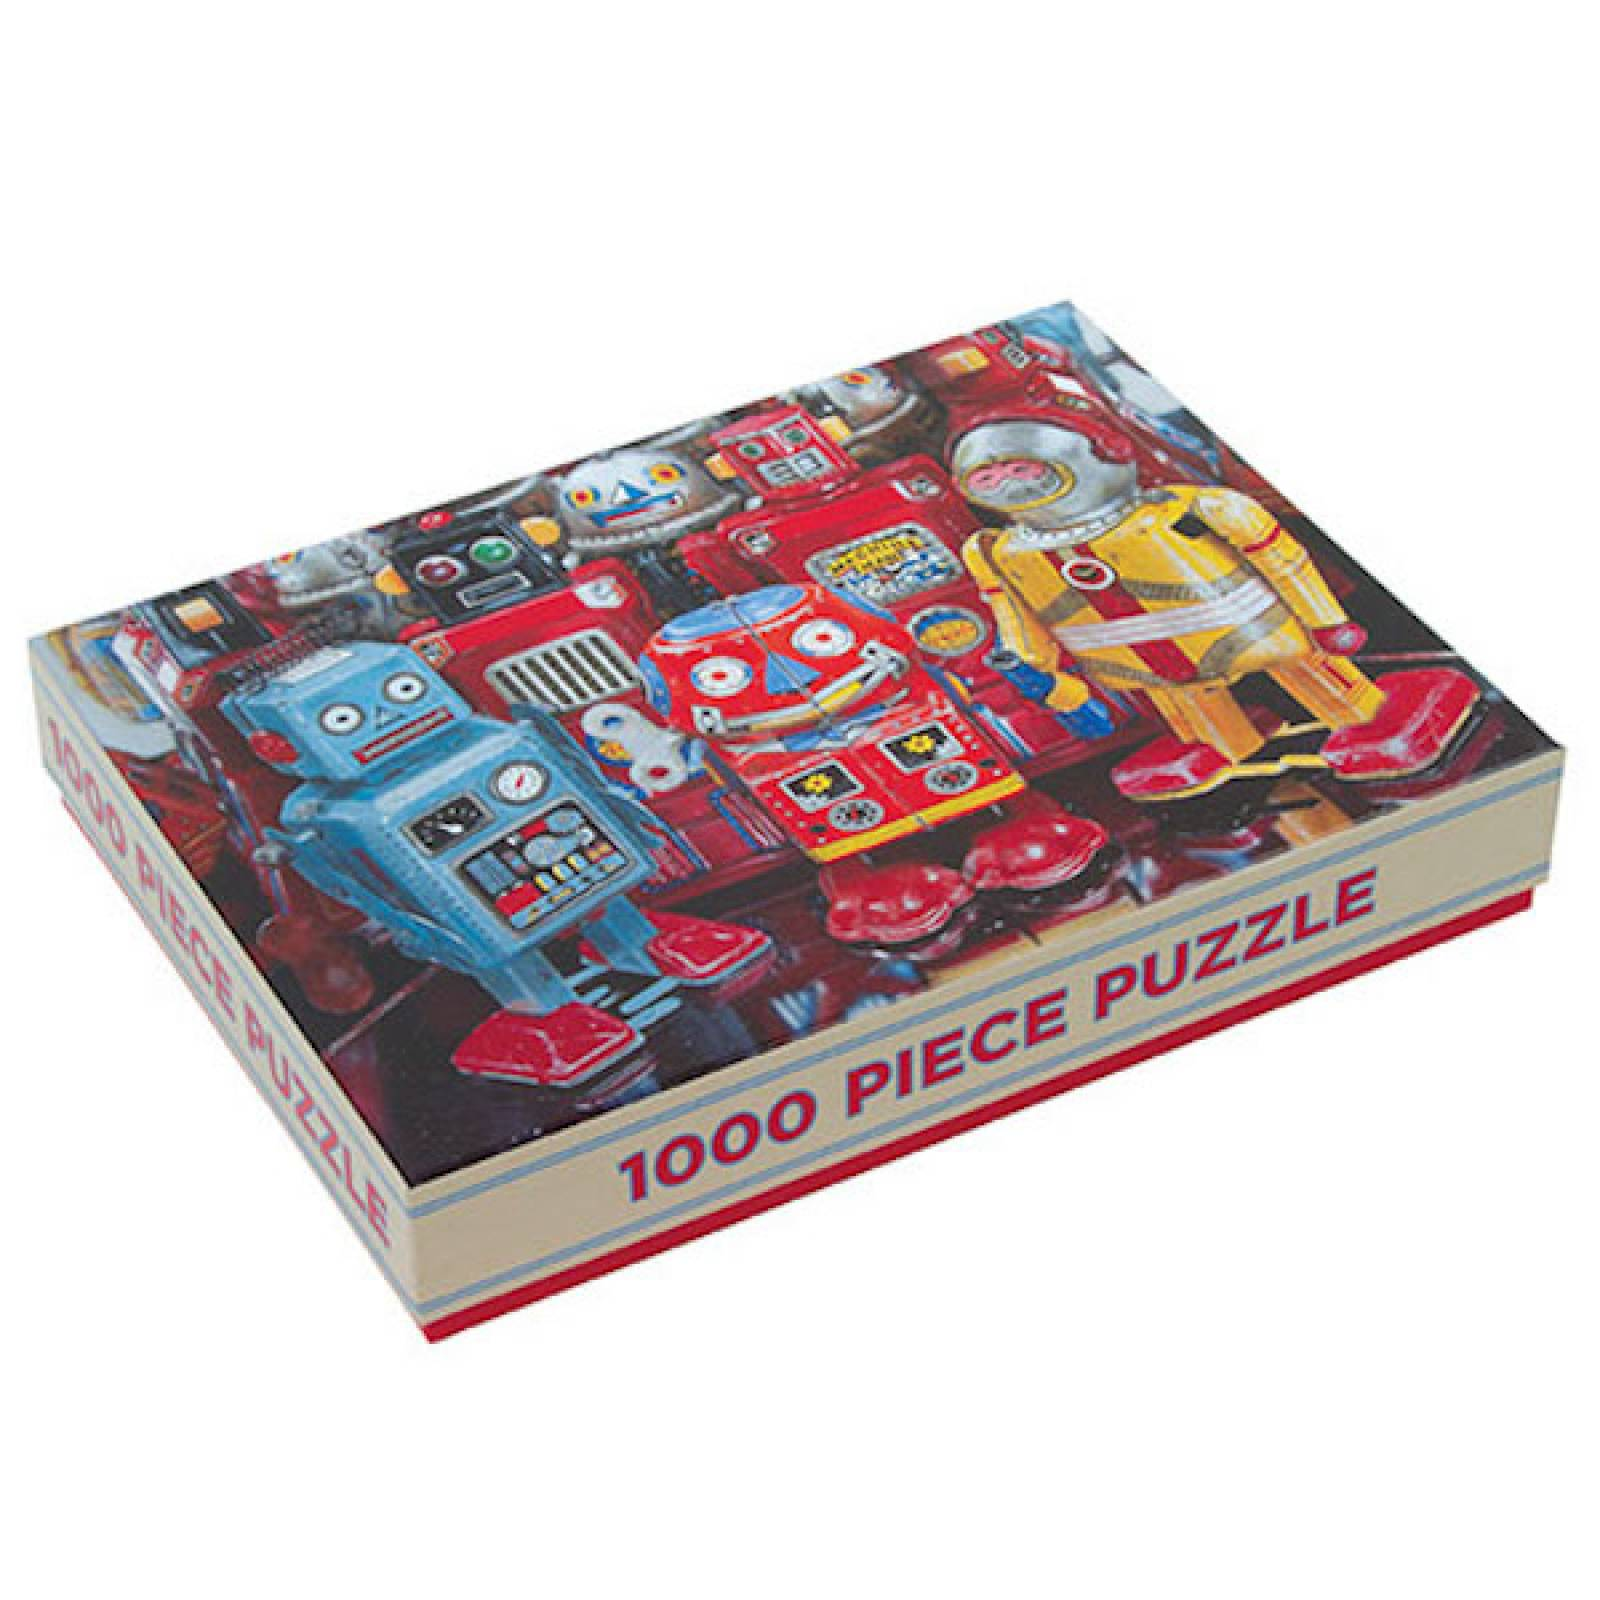 ROBOT EXPLORERS 1000 Piece Puzzle By Galison